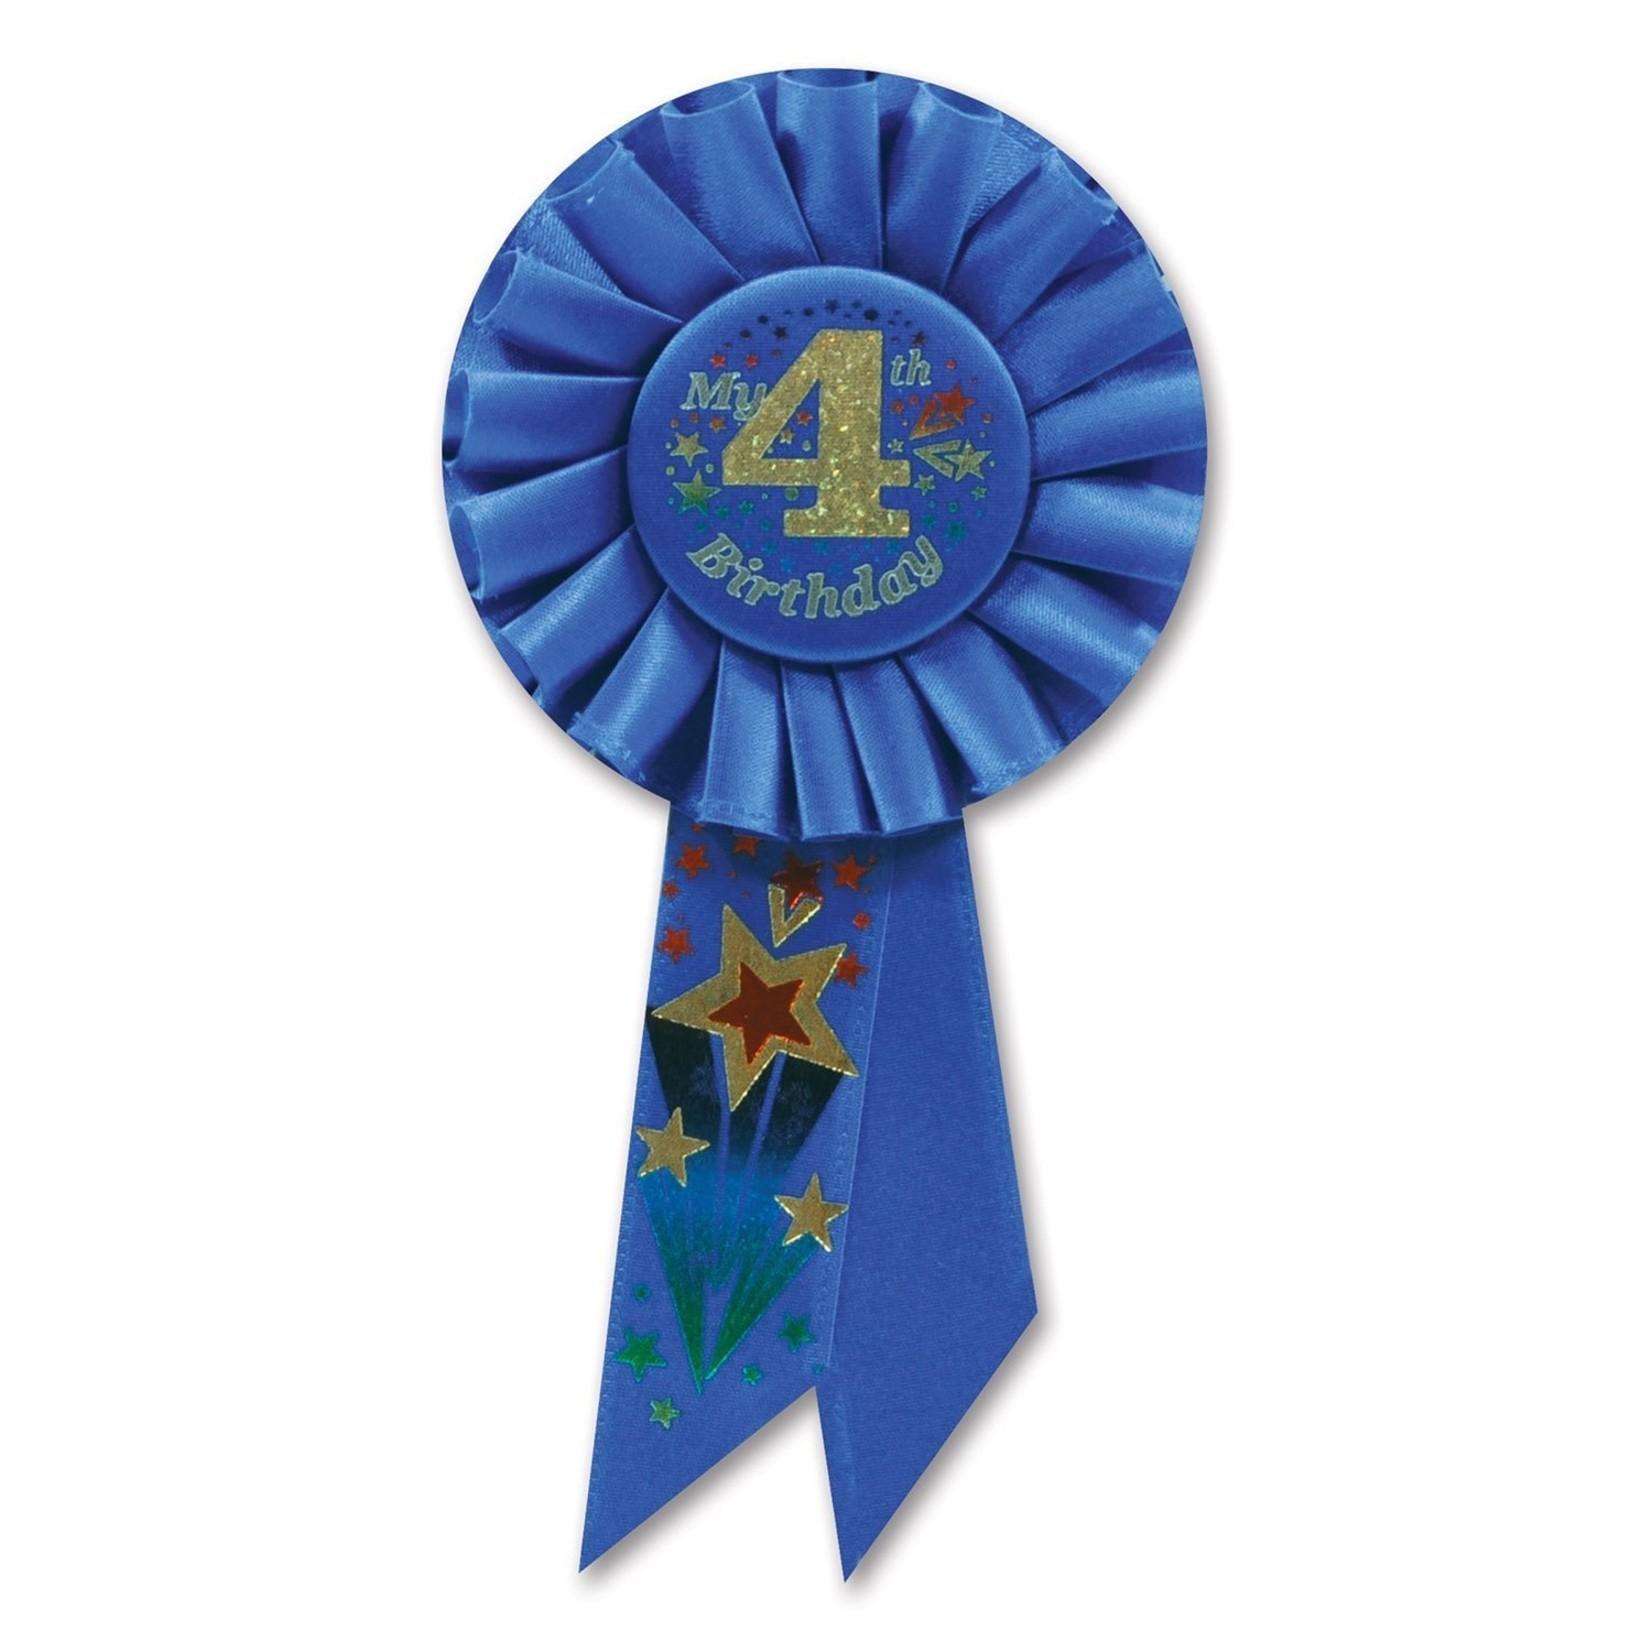 Award Ribbon - My 4th Birthday